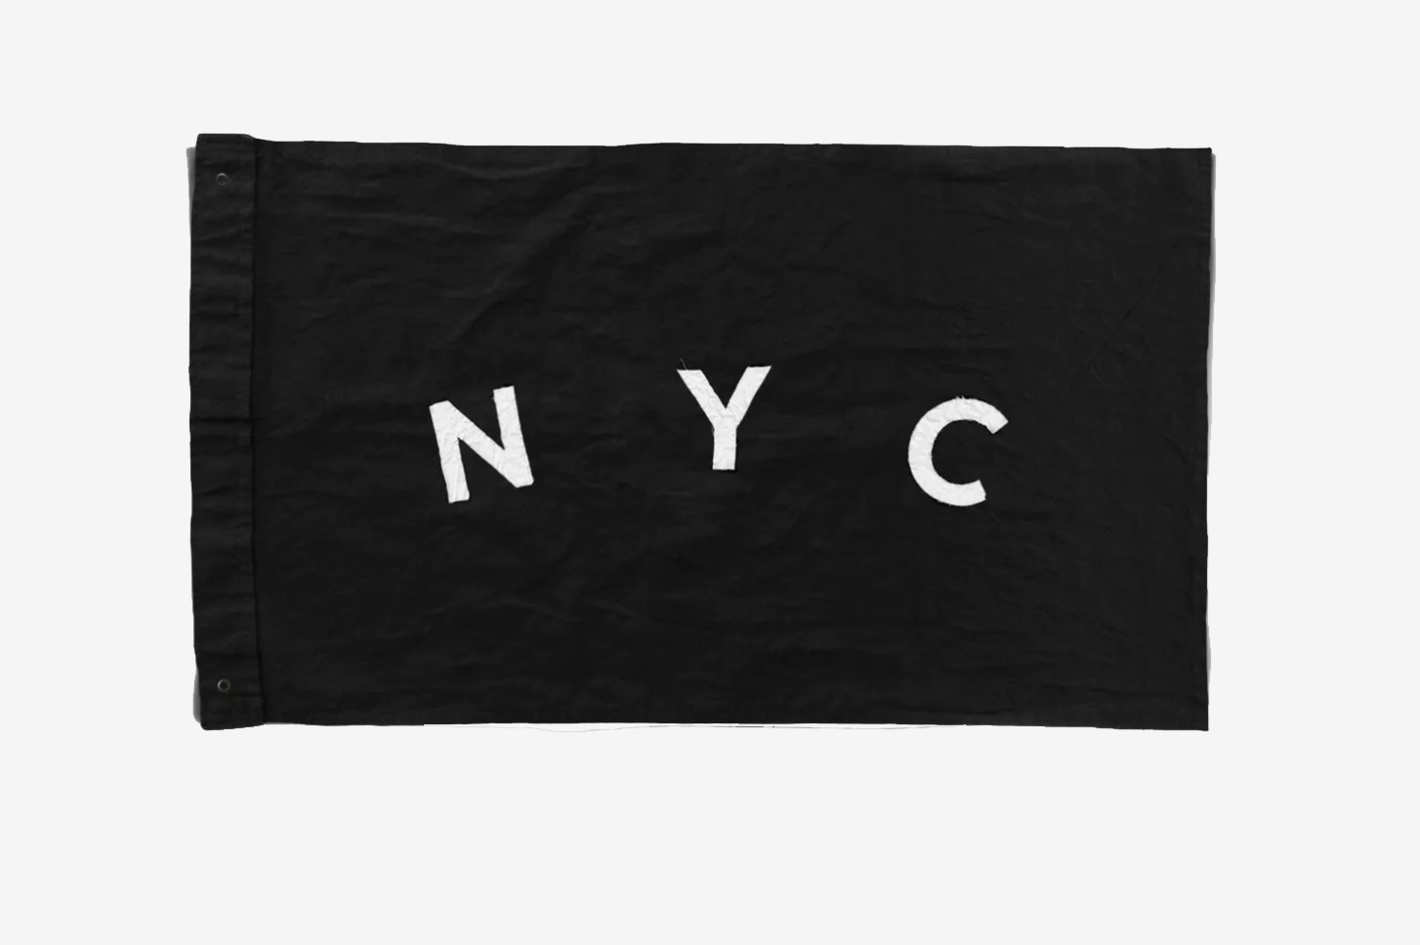 Wild Standard NYC Flag